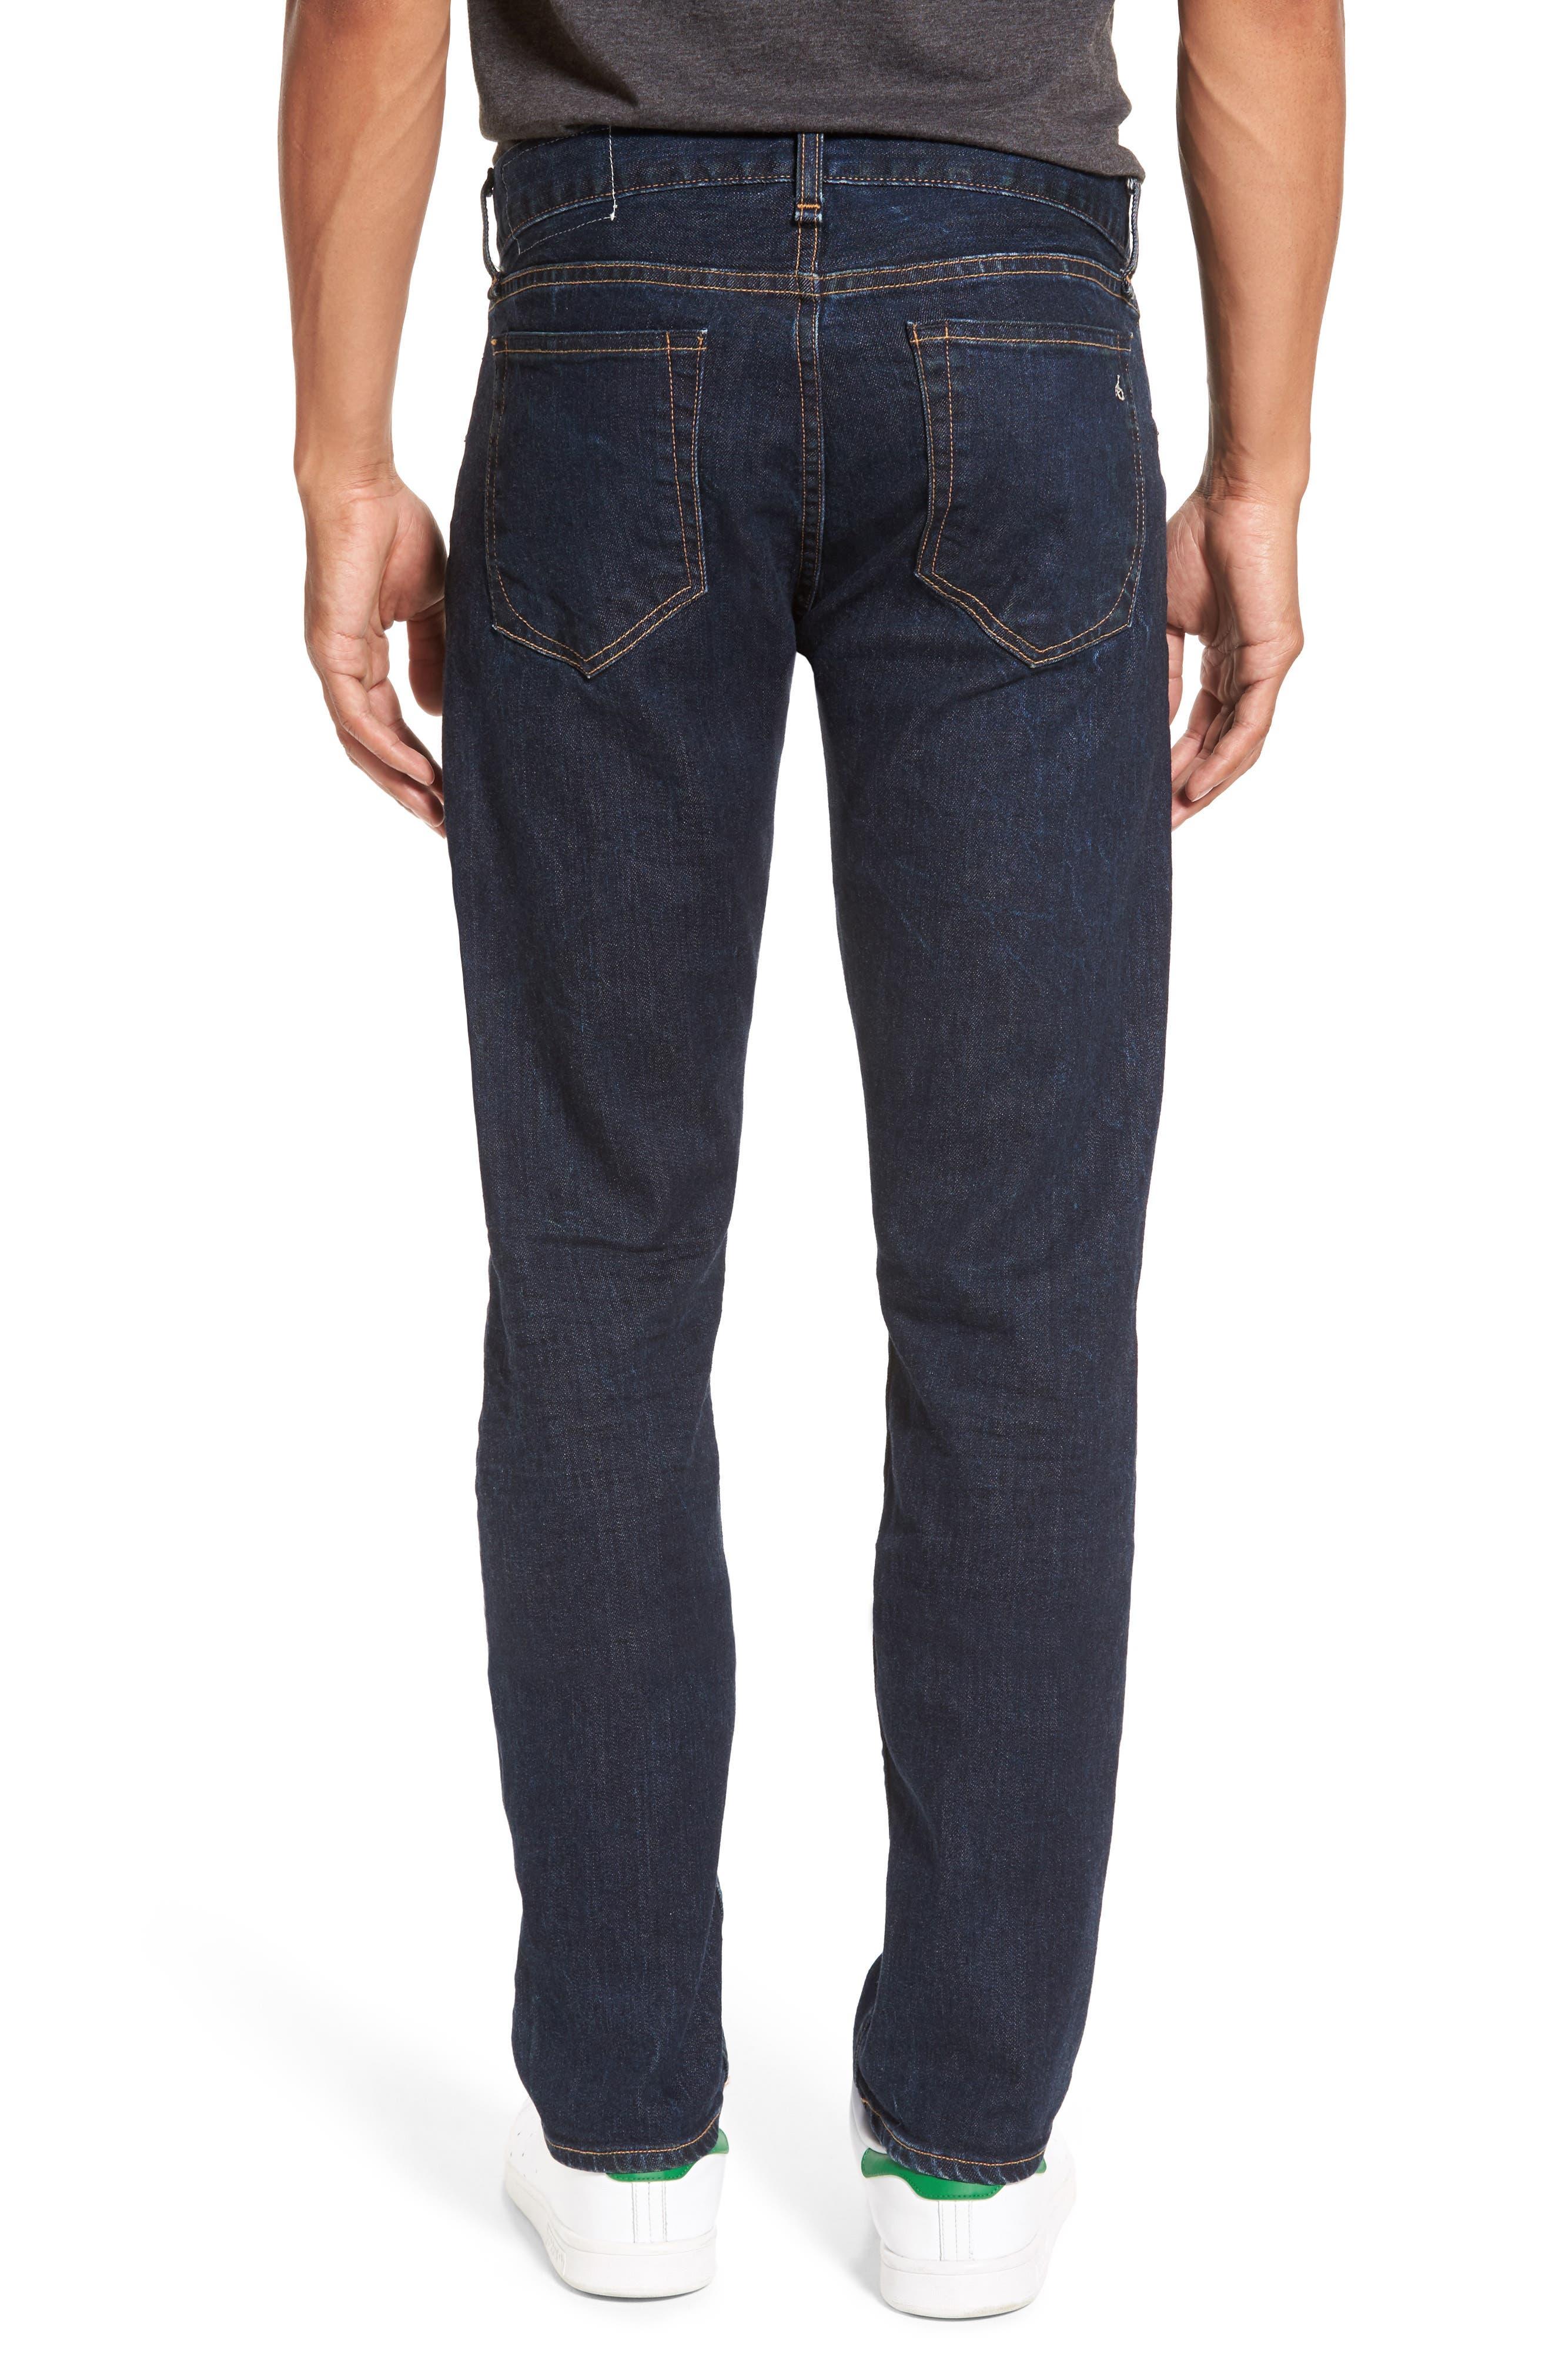 RAG & BONE, Standard Issue Fit 3 Slim Straight Leg Jeans, Alternate thumbnail 2, color, HERITAGE